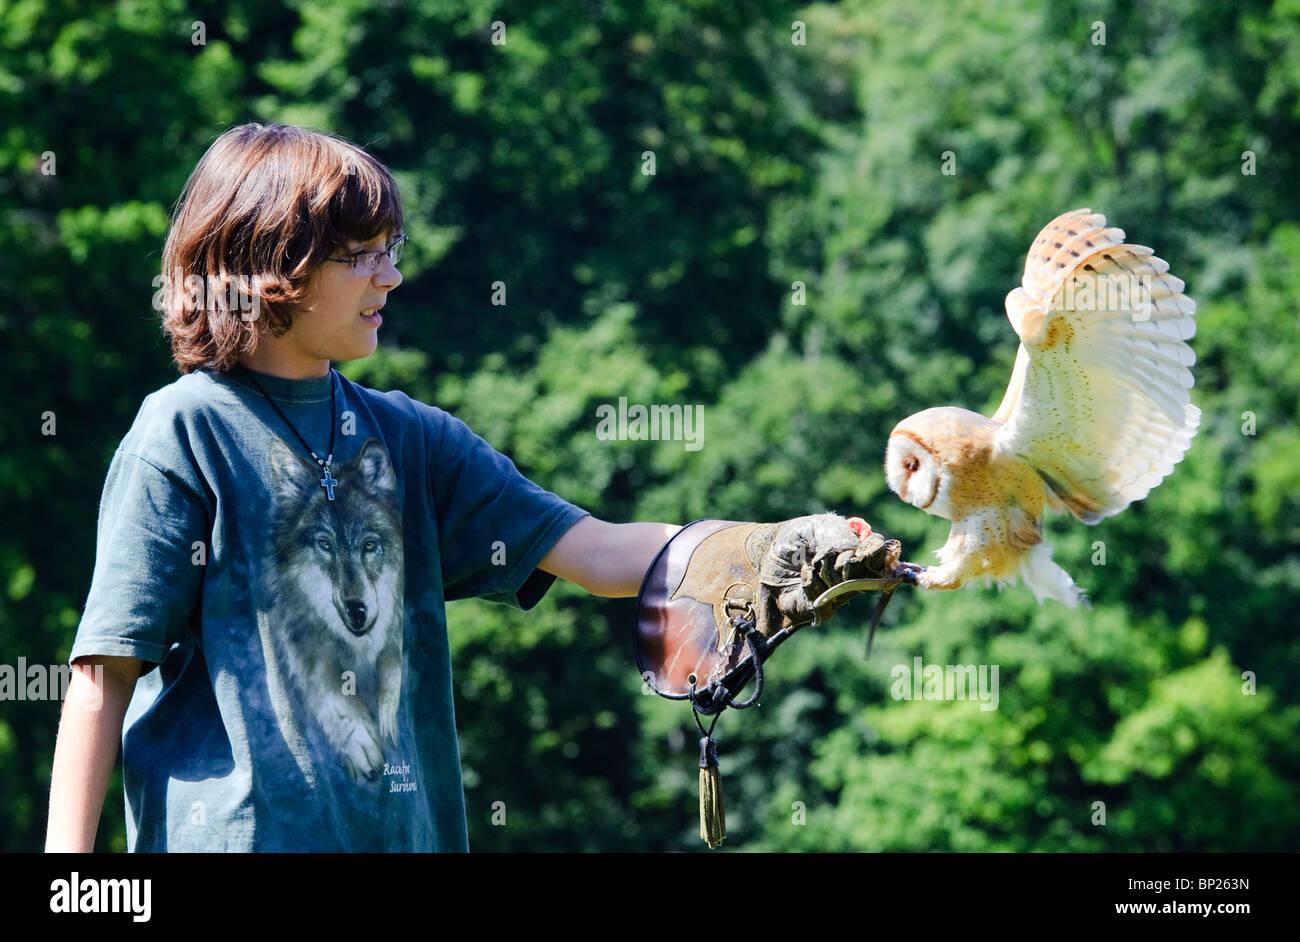 Falconry Display with Barn Owl - Stock Image